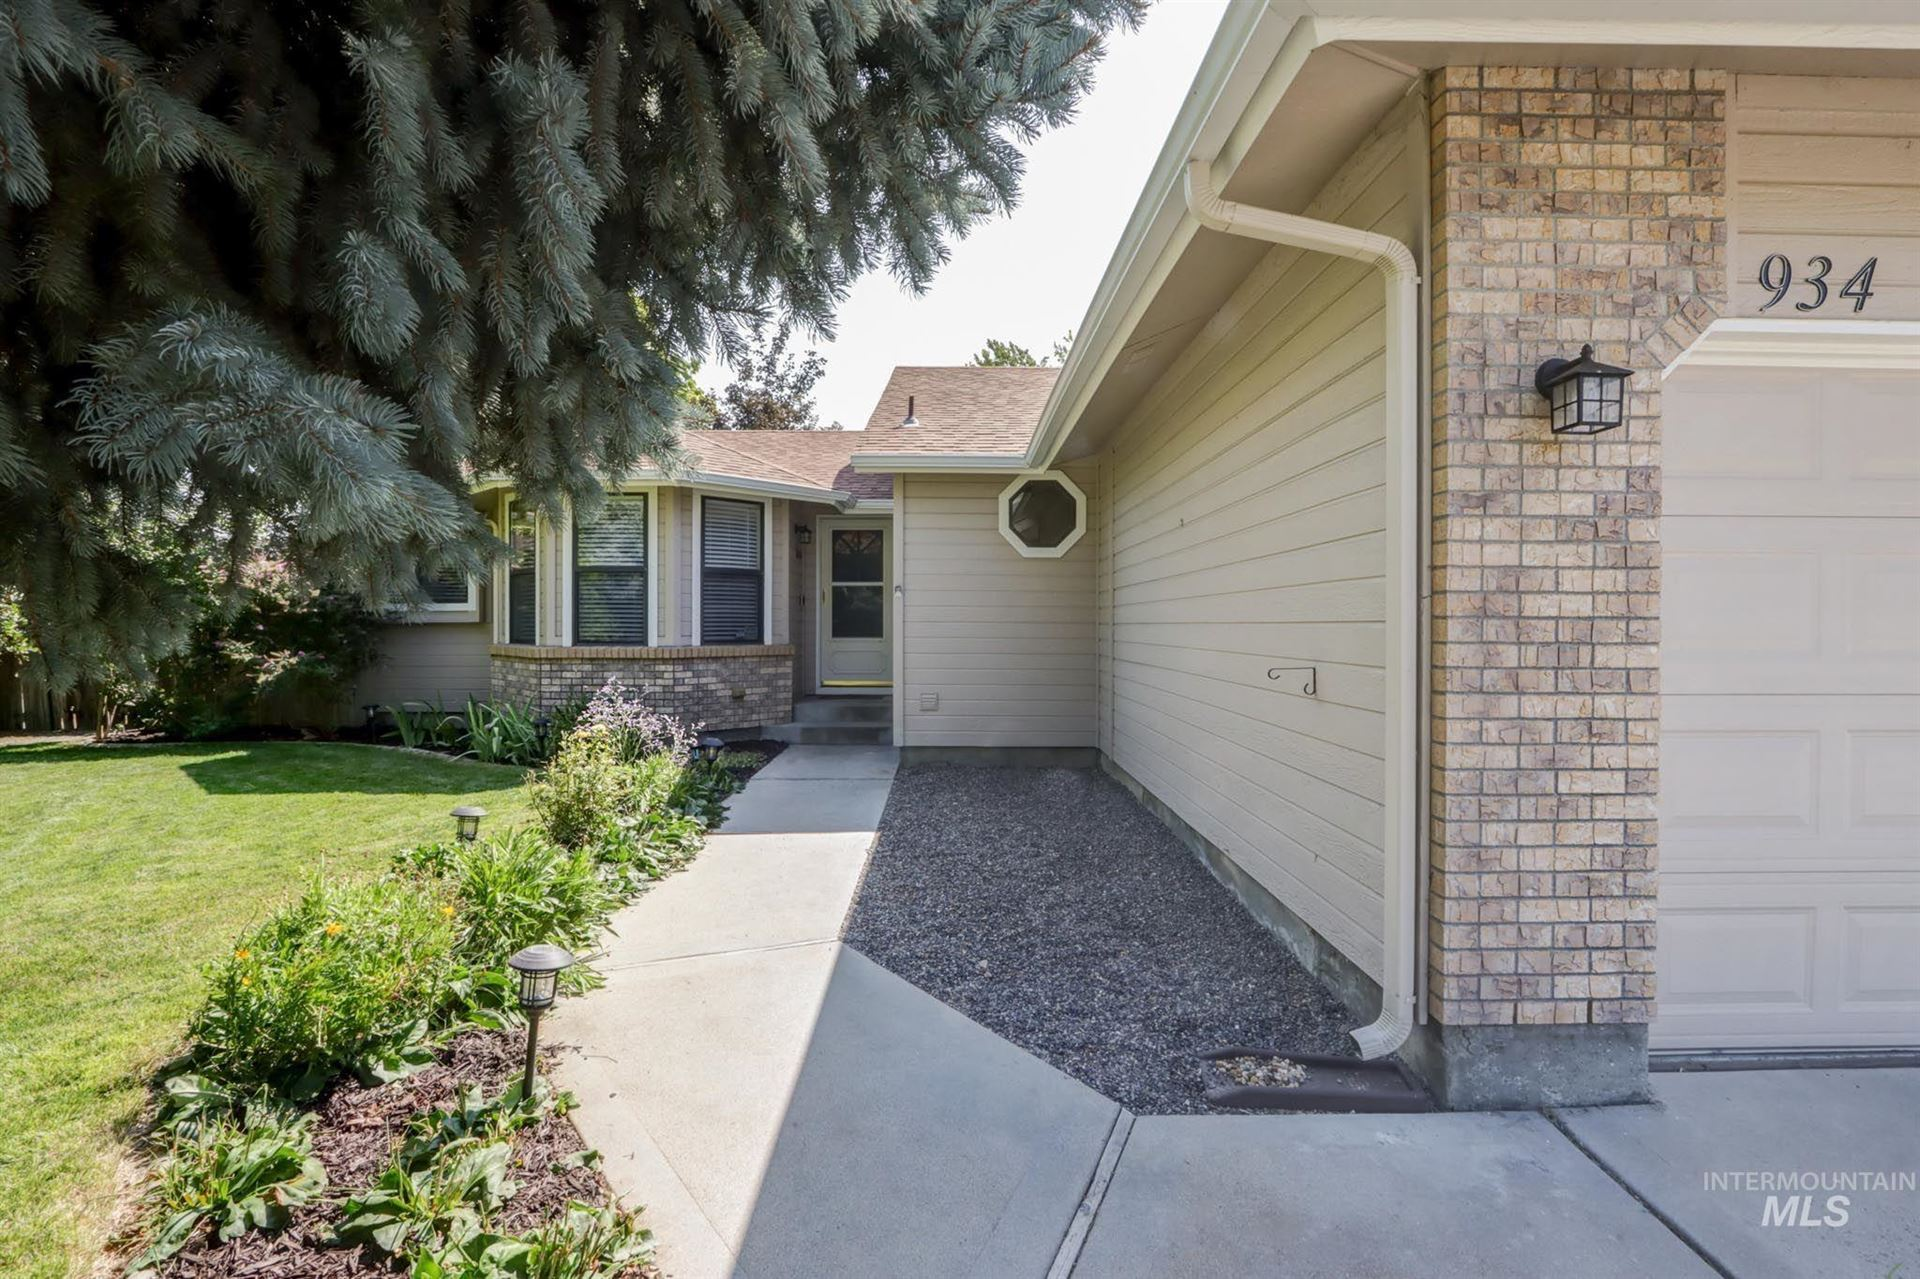 Photo of 934 N Iris Place, Boise, ID 83704 (MLS # 98822582)